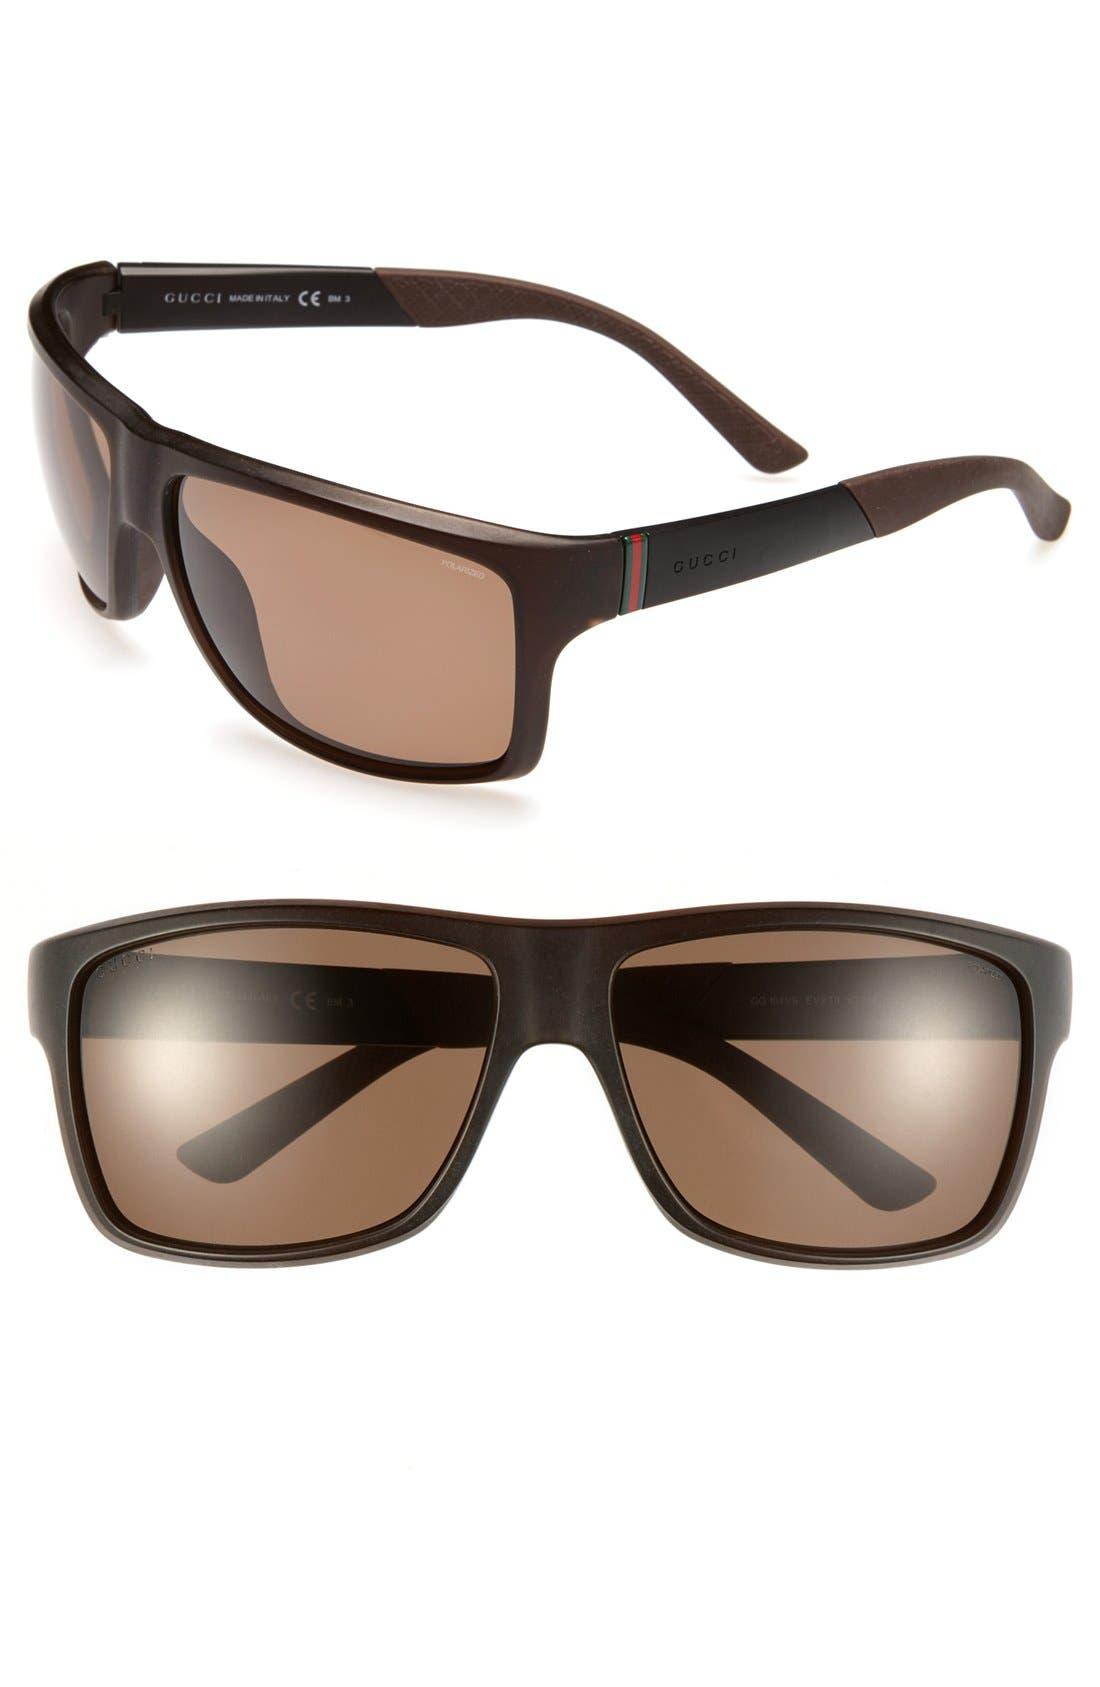 Alternate Image 1 Selected - Gucci 62mm Polarized Sunglasses